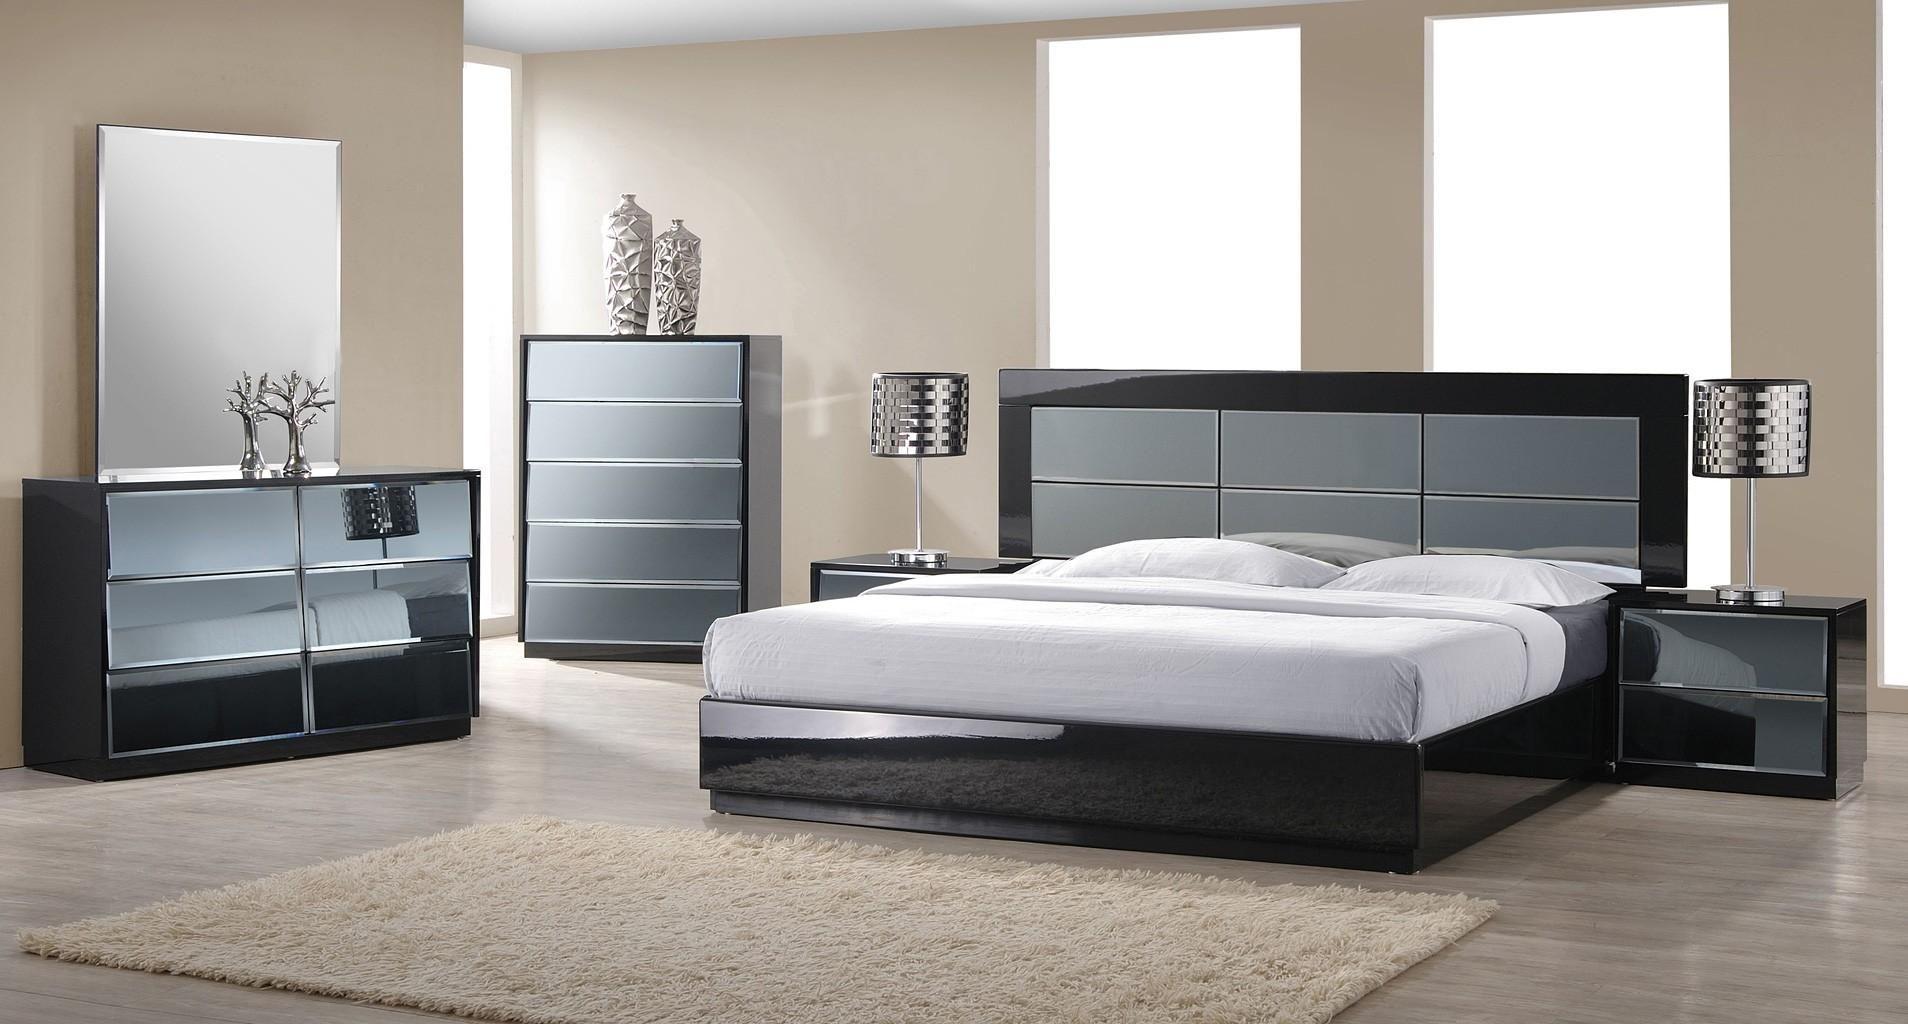 Venice Platform Bedroom Set Platform Bedroom Sets Bedroom Sets King Bedroom Sets